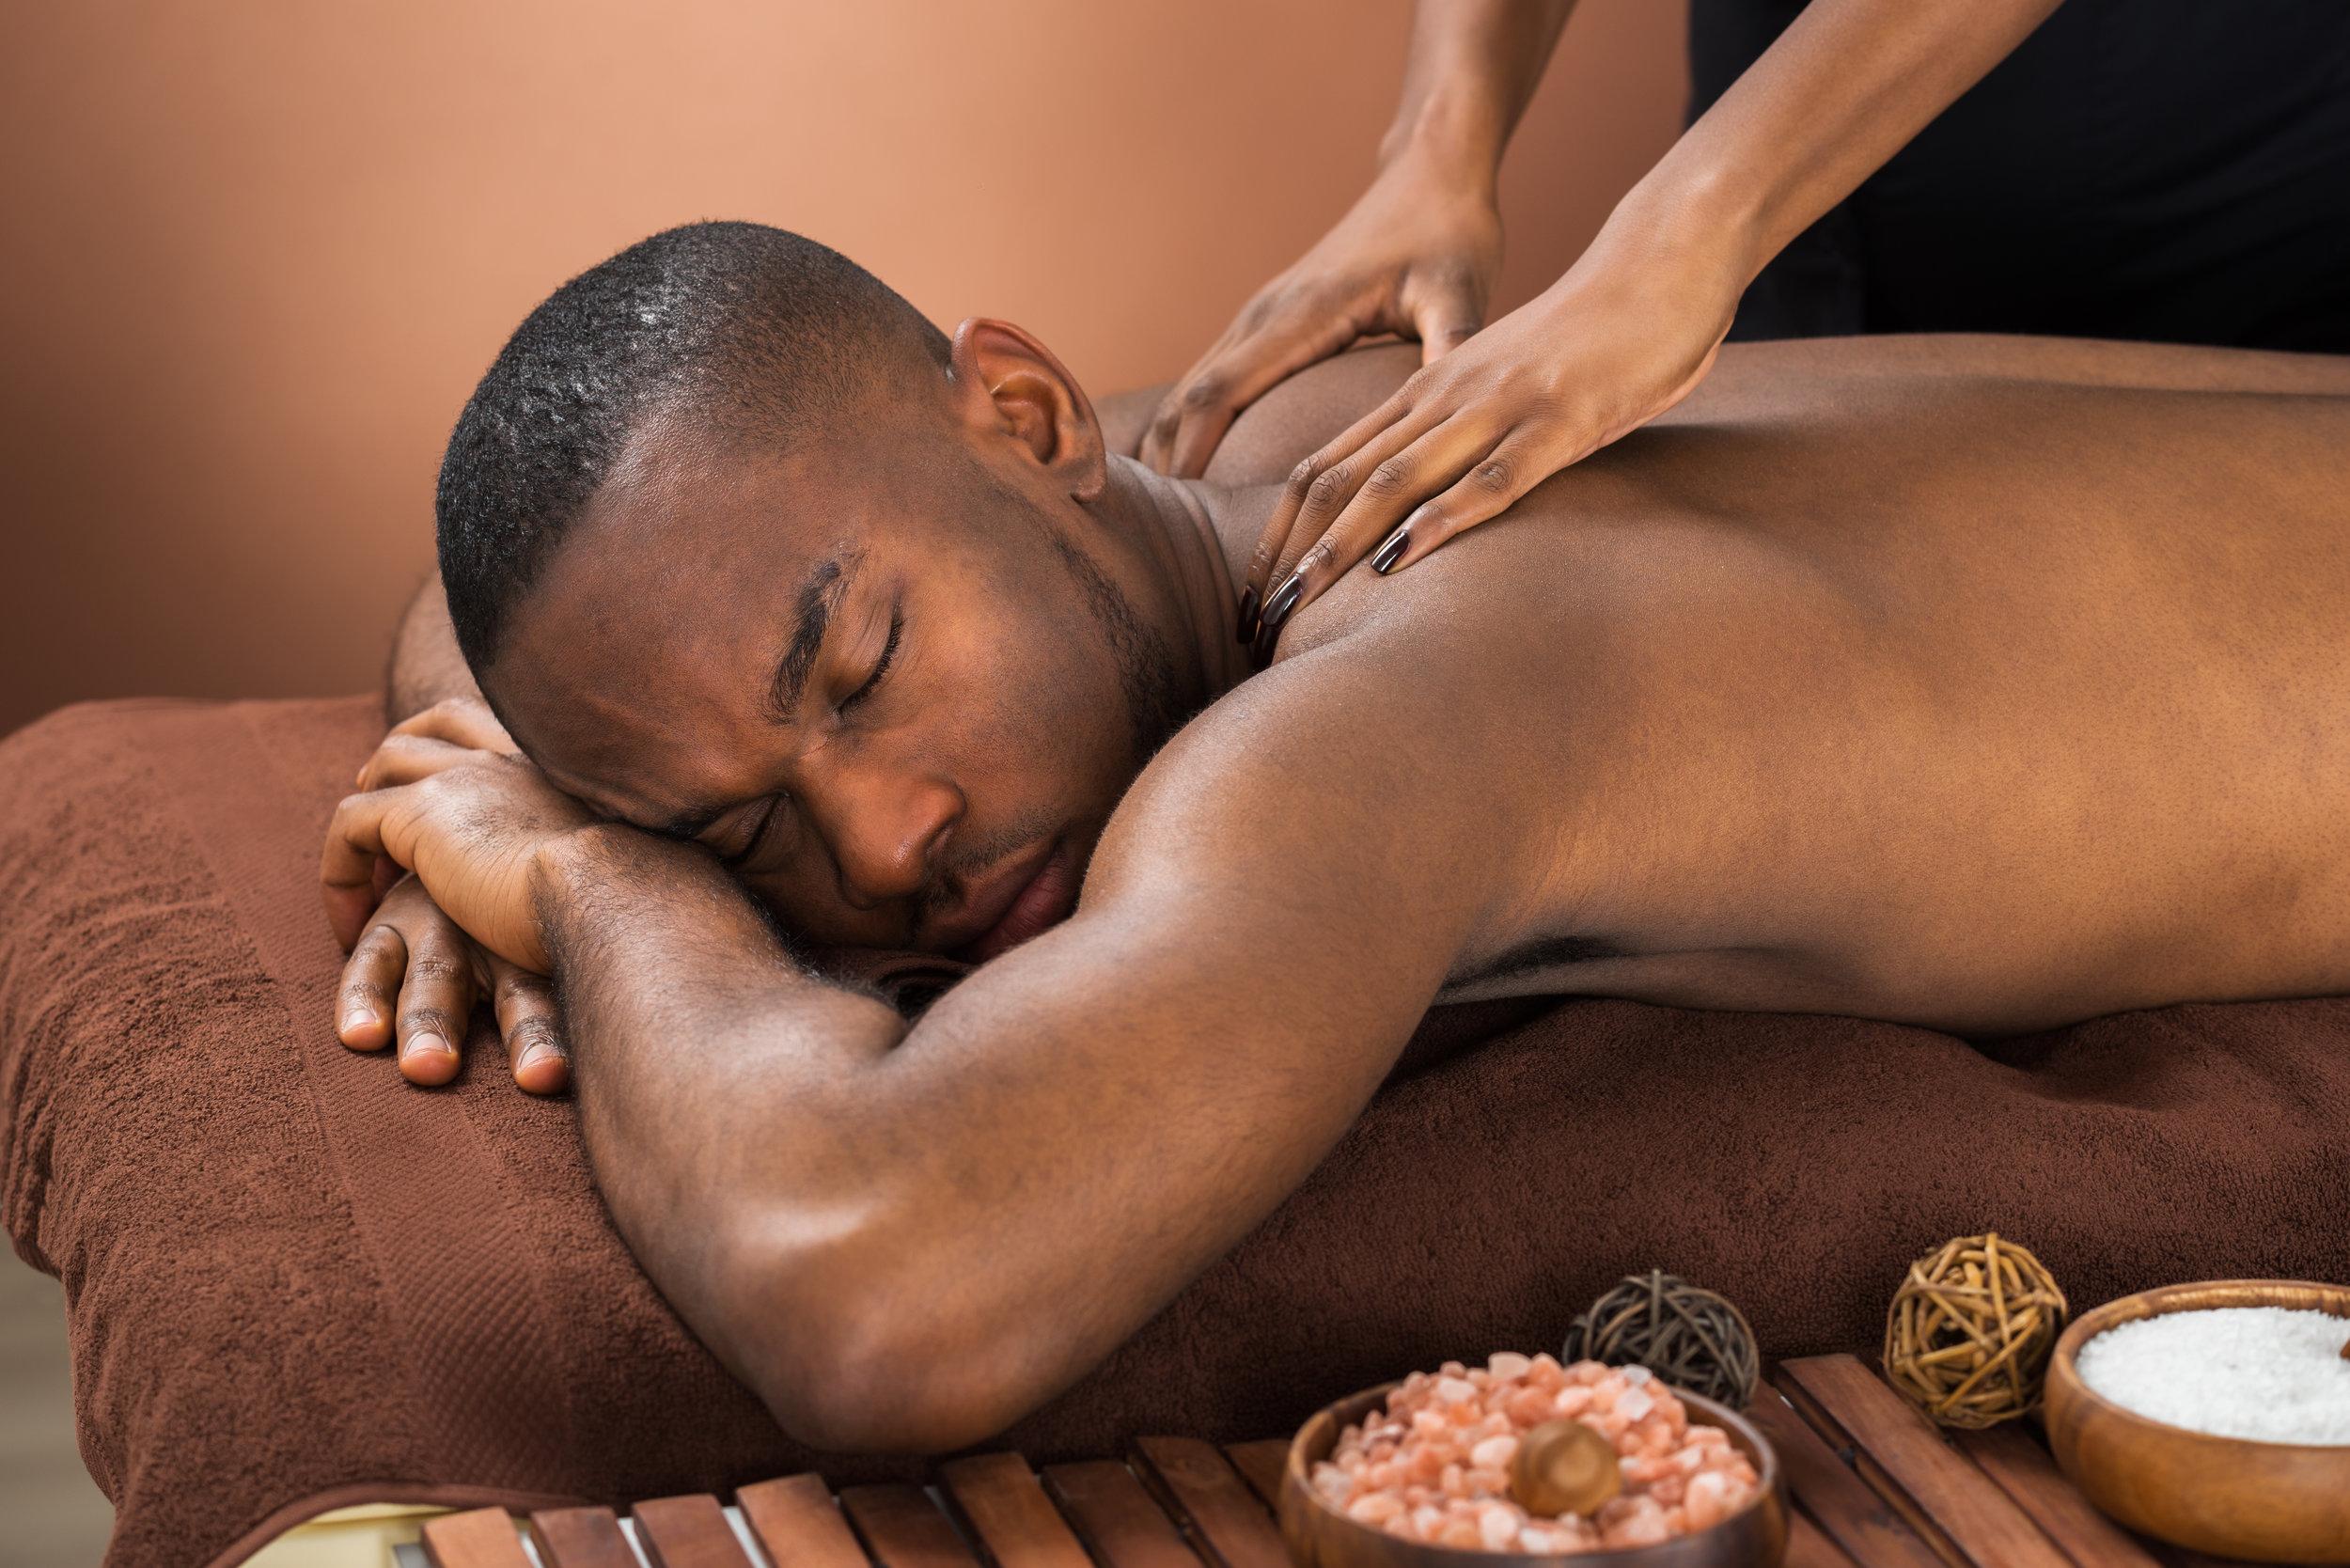 iStock-Man Receiving Massage Treatment609094066.jpg